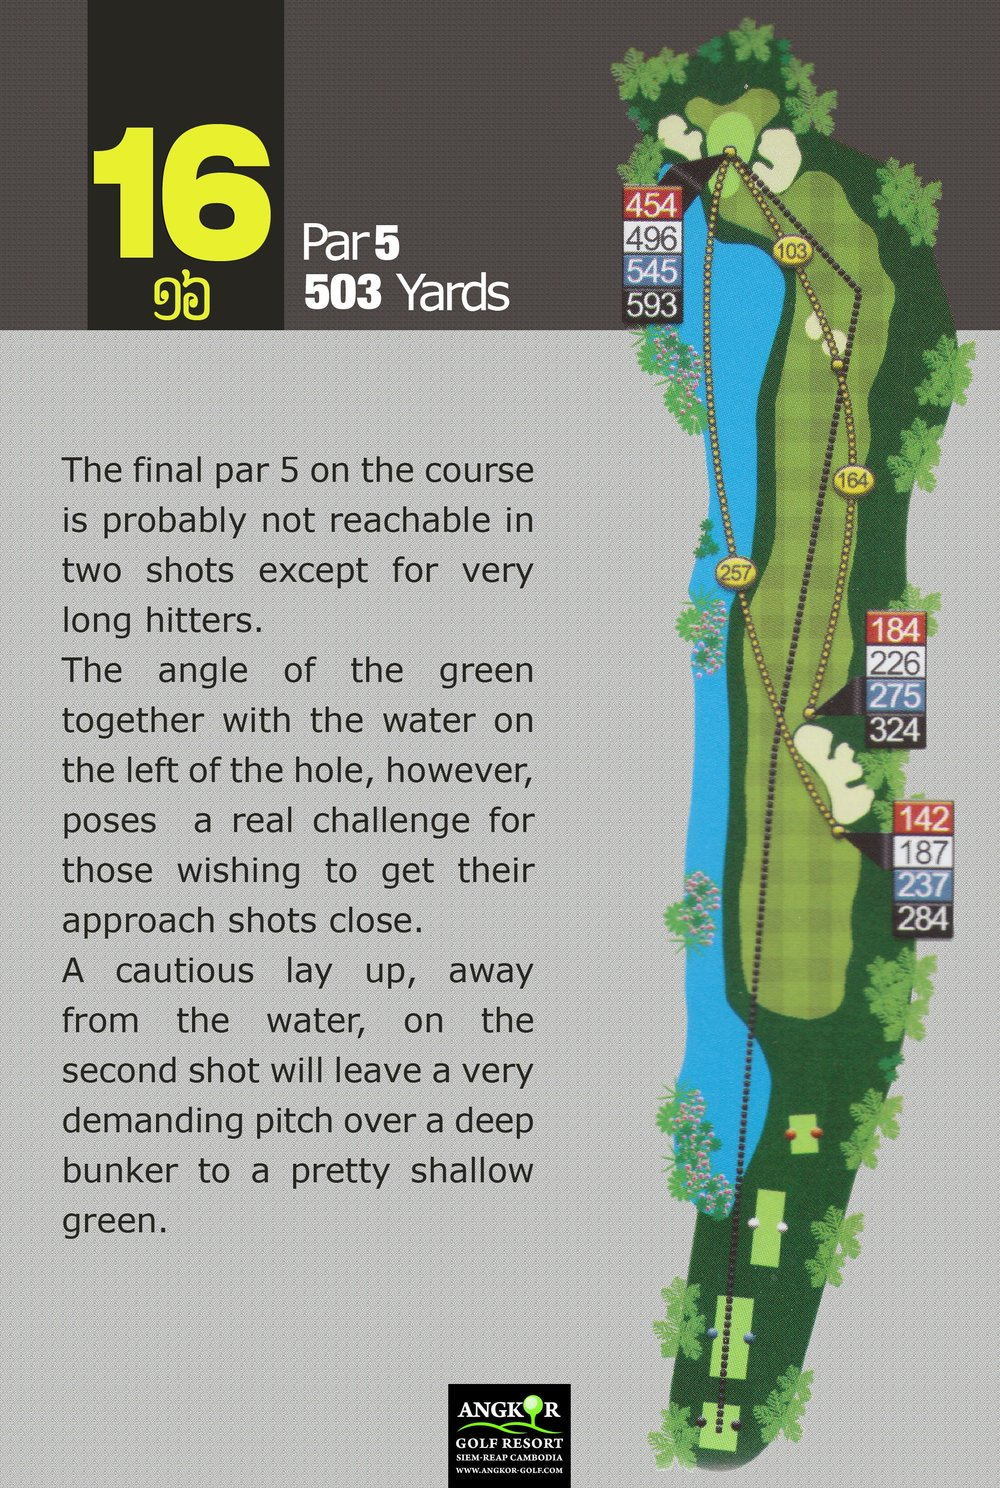 Hole 16 - Par 5 593 Yards